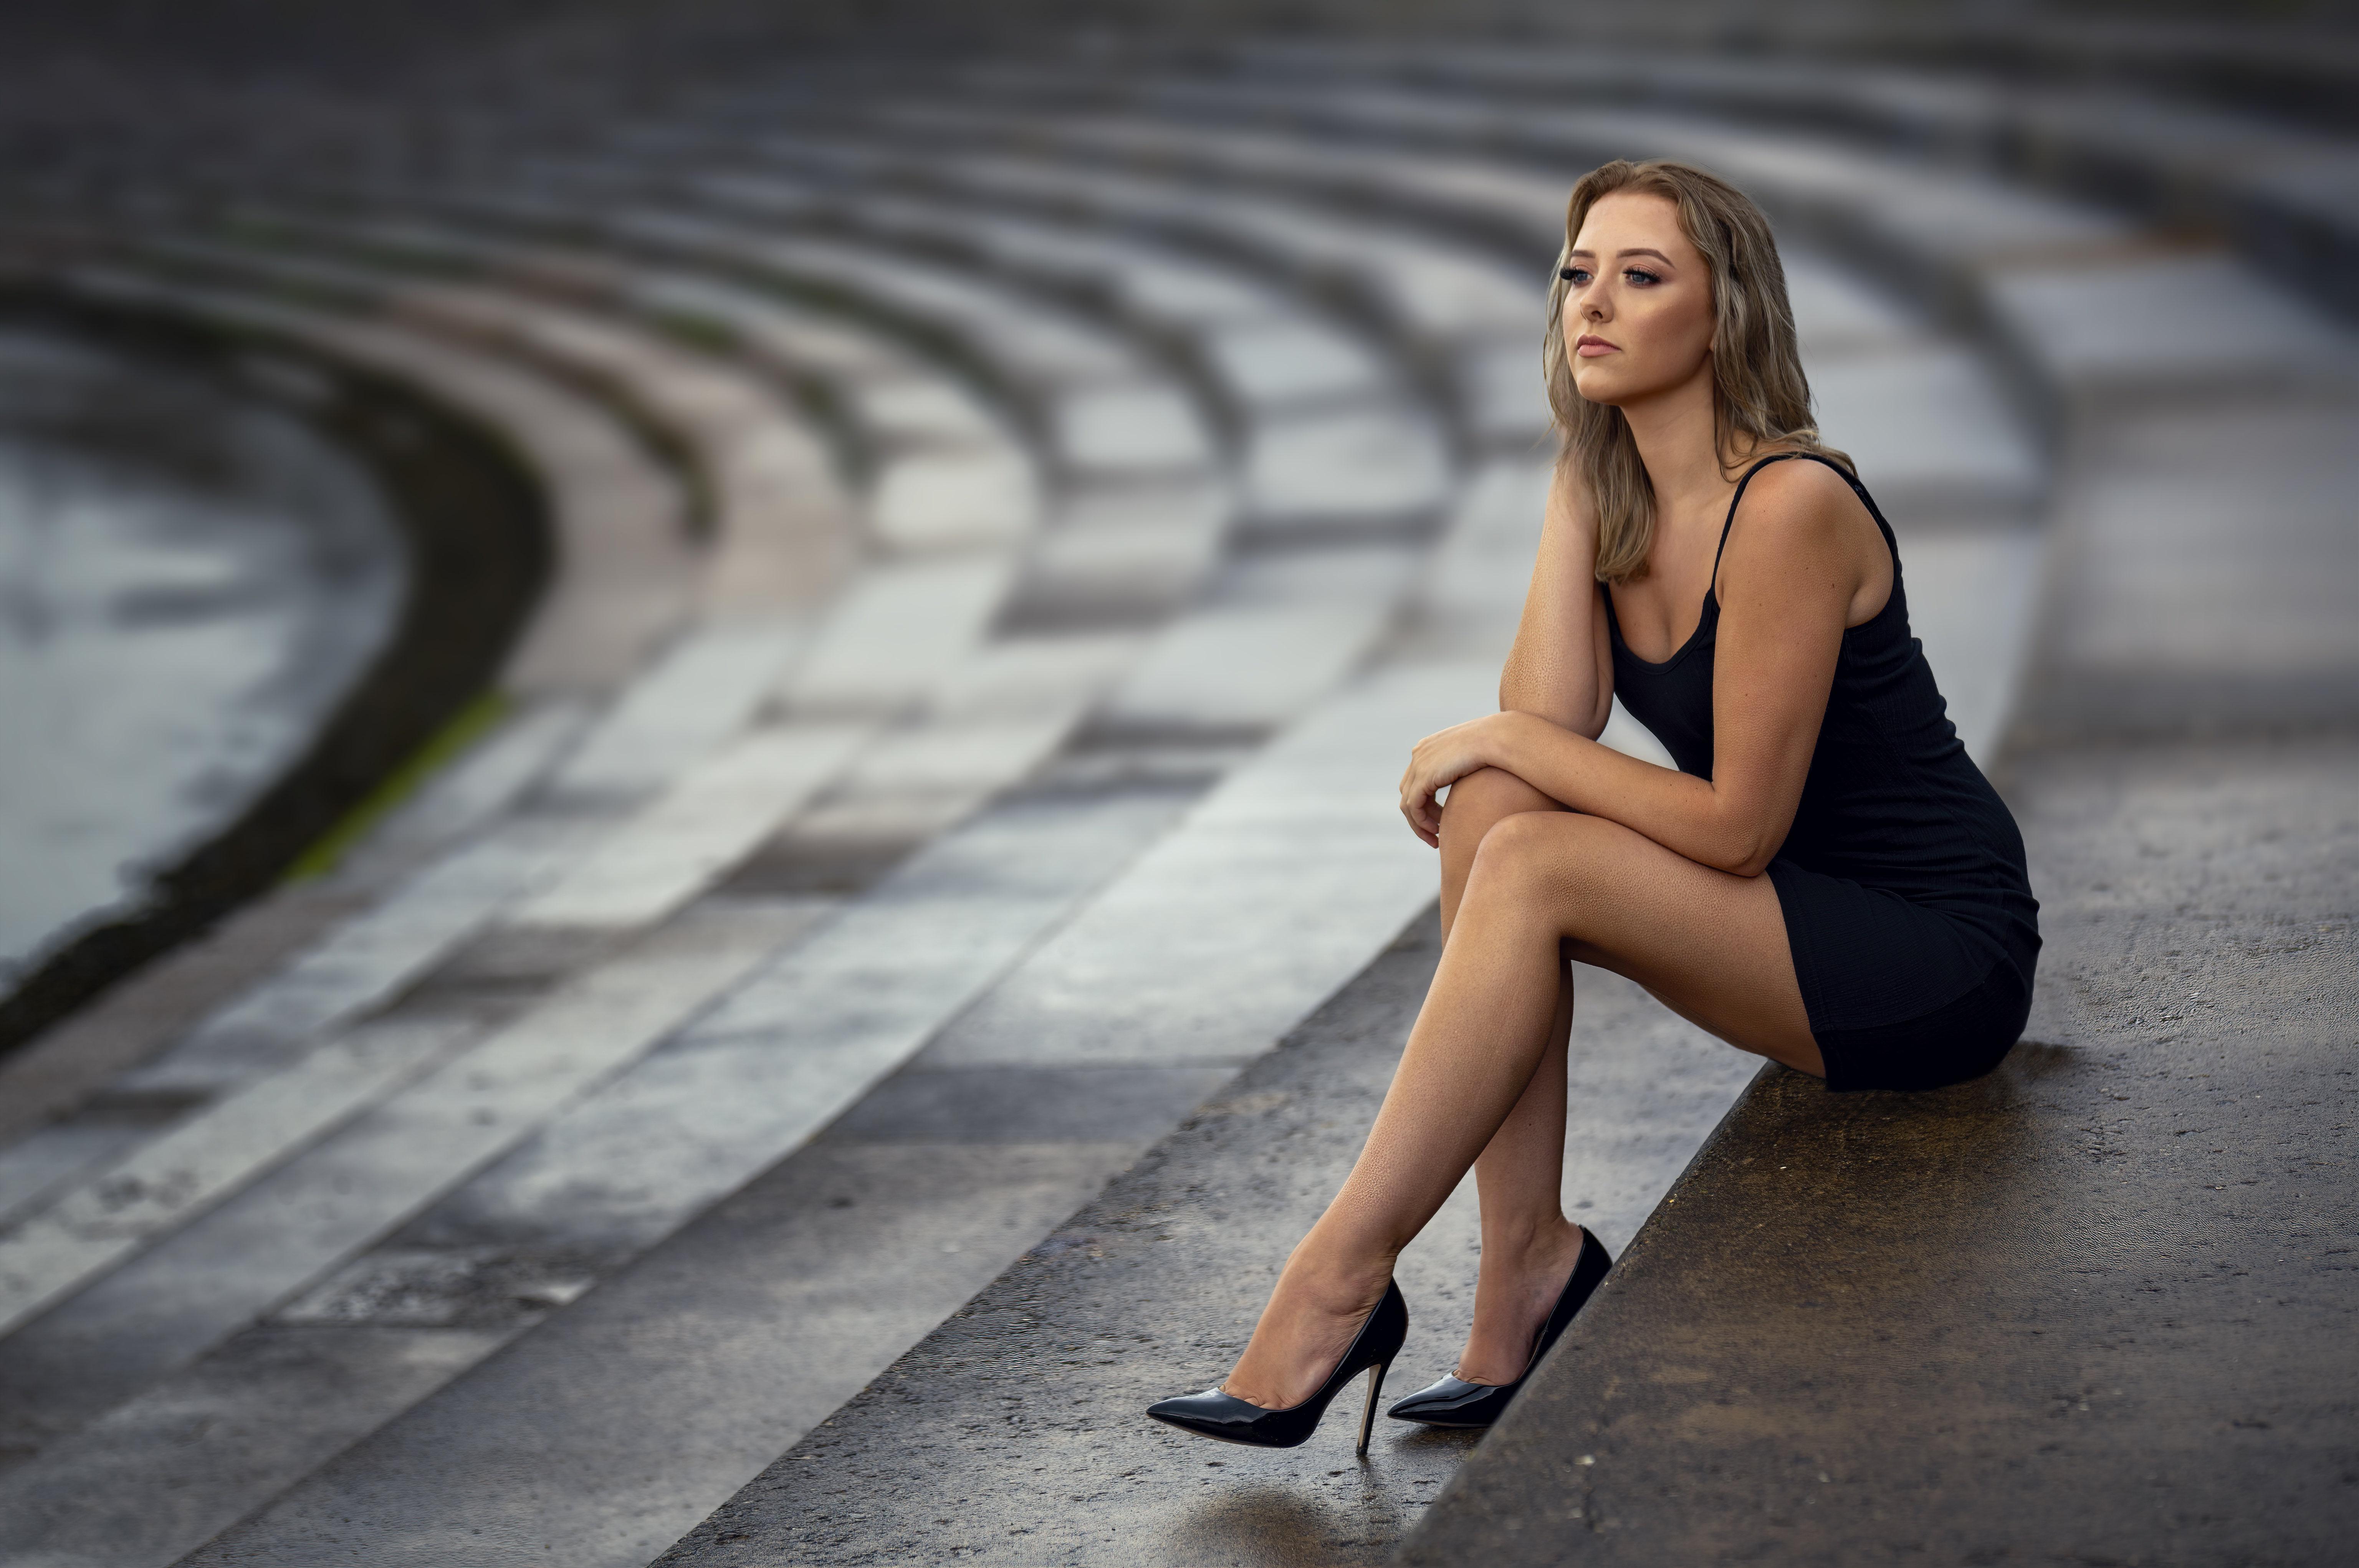 Alex Siracusano Model Women Blonde Dark Eyes Dress Black Dress Legs High Heels Sitting Looking Away  6144x4084